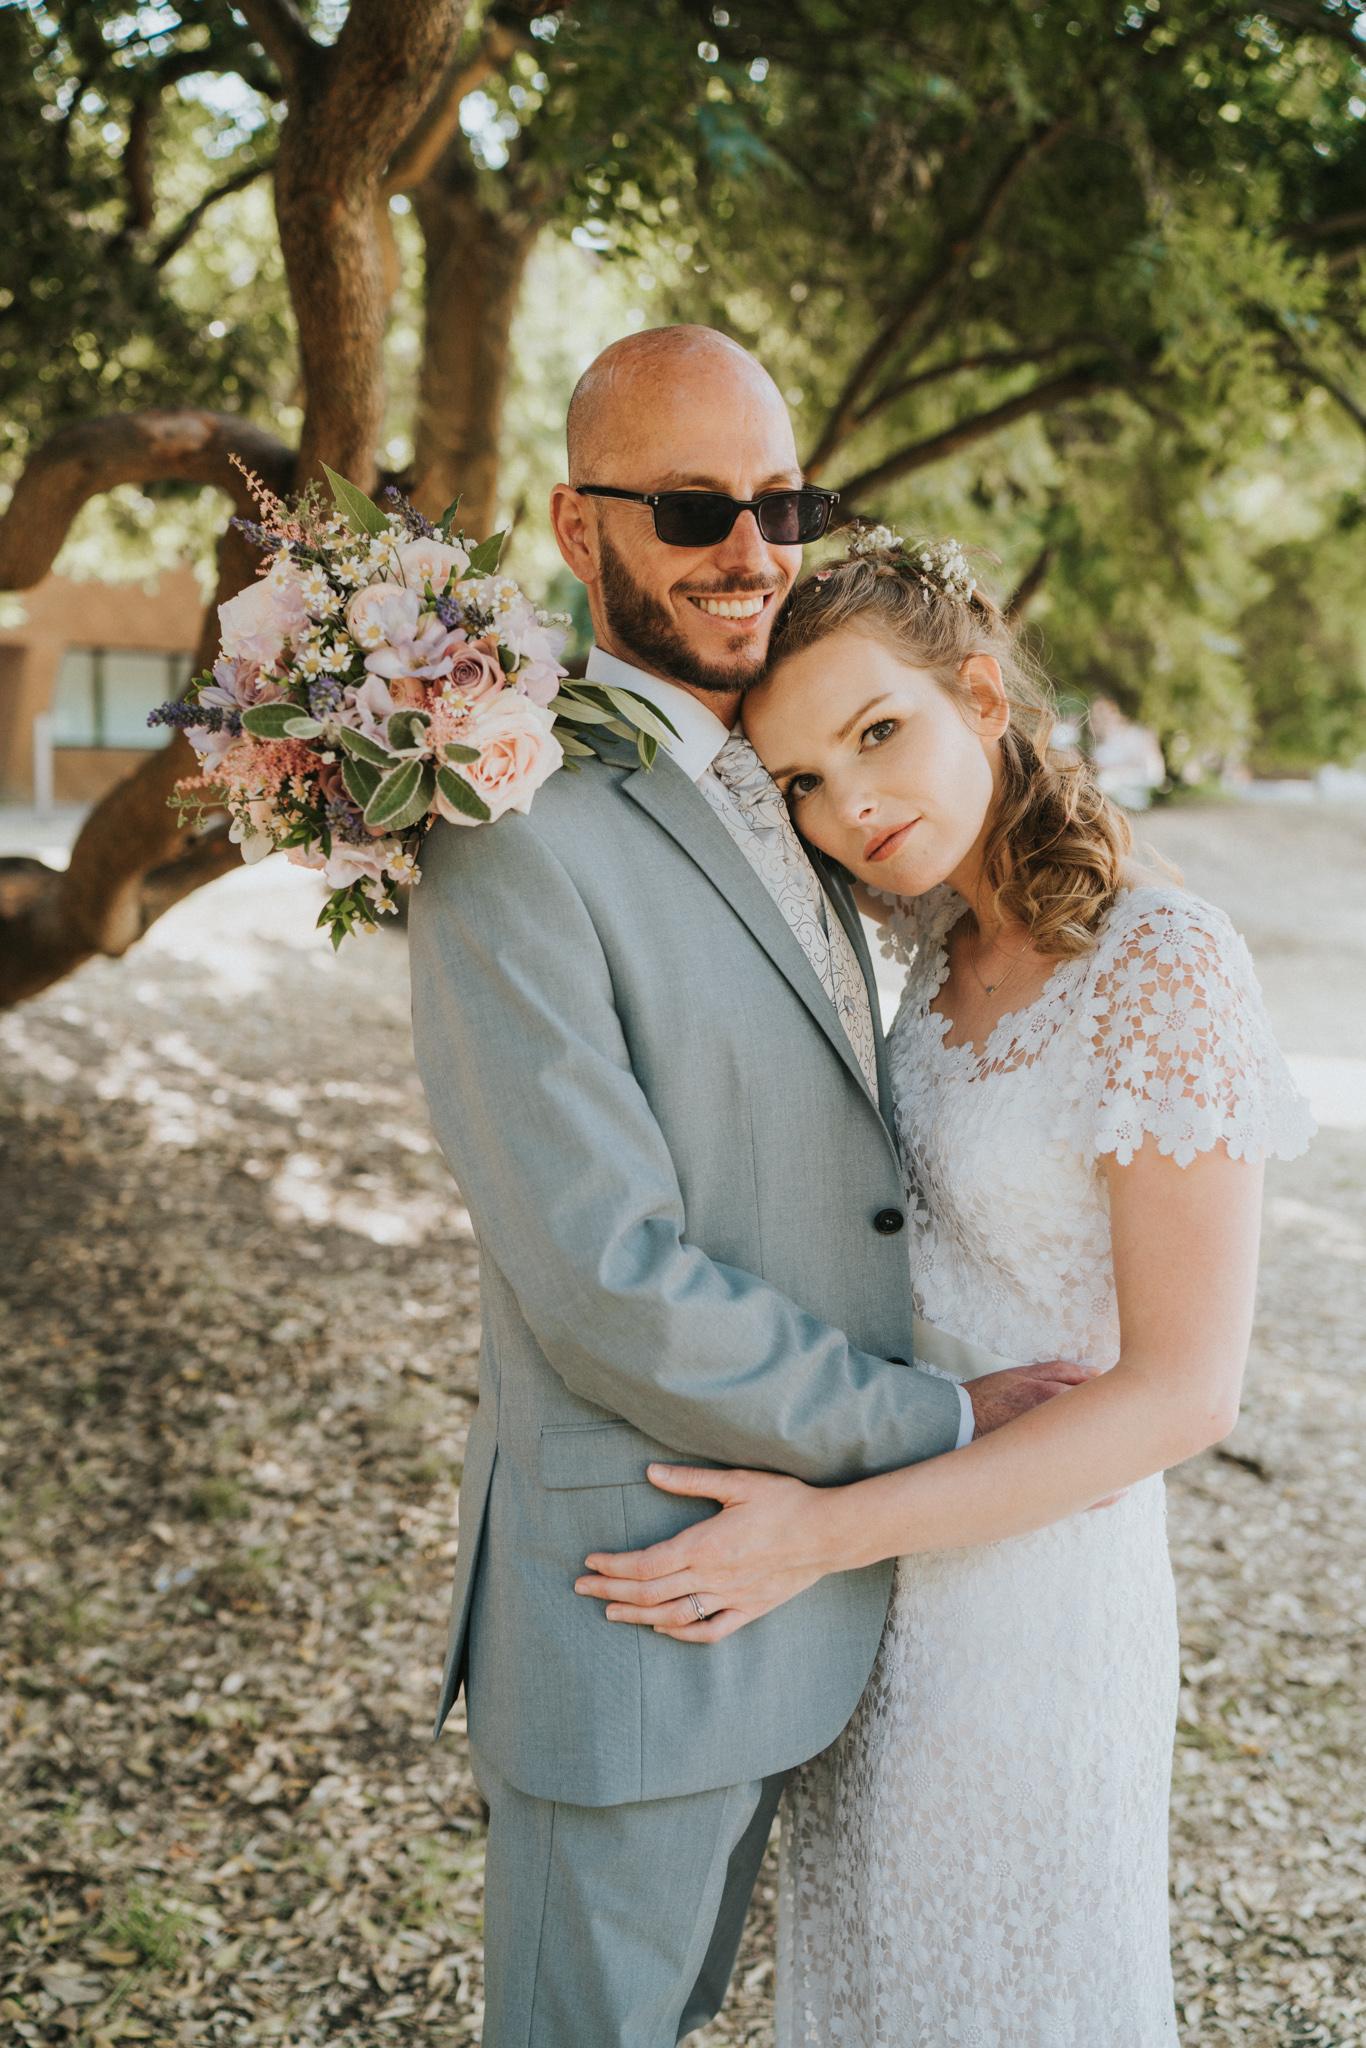 Grace-Elizabeth-Georgie-Amalaketu-Firstsite-Colchester-Essex-Boho-Buddhist-Wedding-Alternative-Wedding-Photography-Essex (84 of 100).jpg